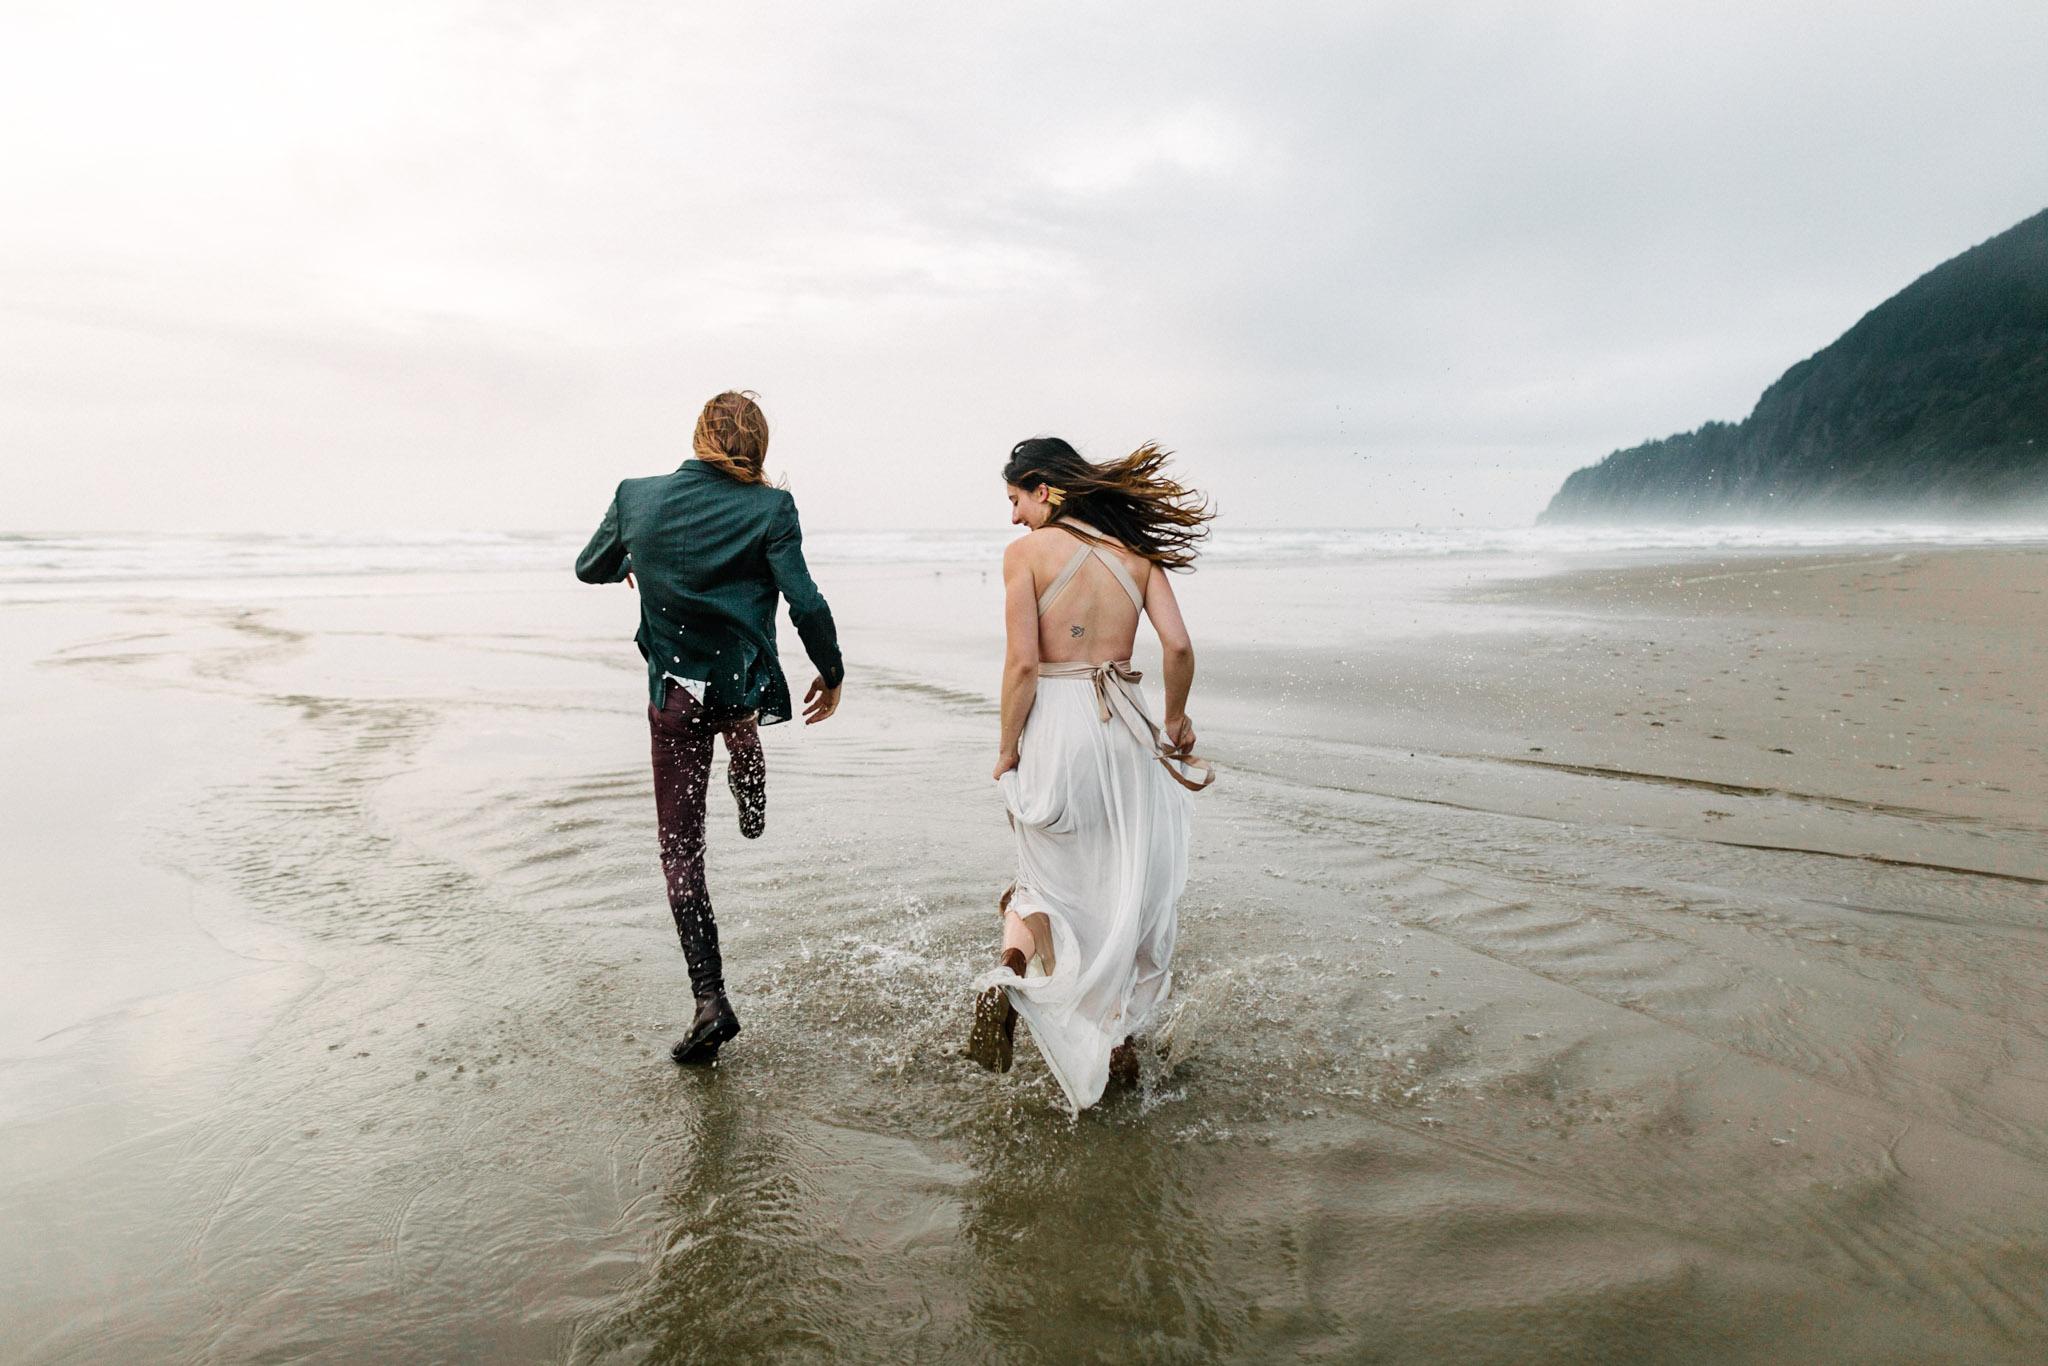 Oregon-Coast-Manzanita-Beach-Engagement-Pia-Anna-Christian-Wedding-Photography-PNW-GB-32.jpg